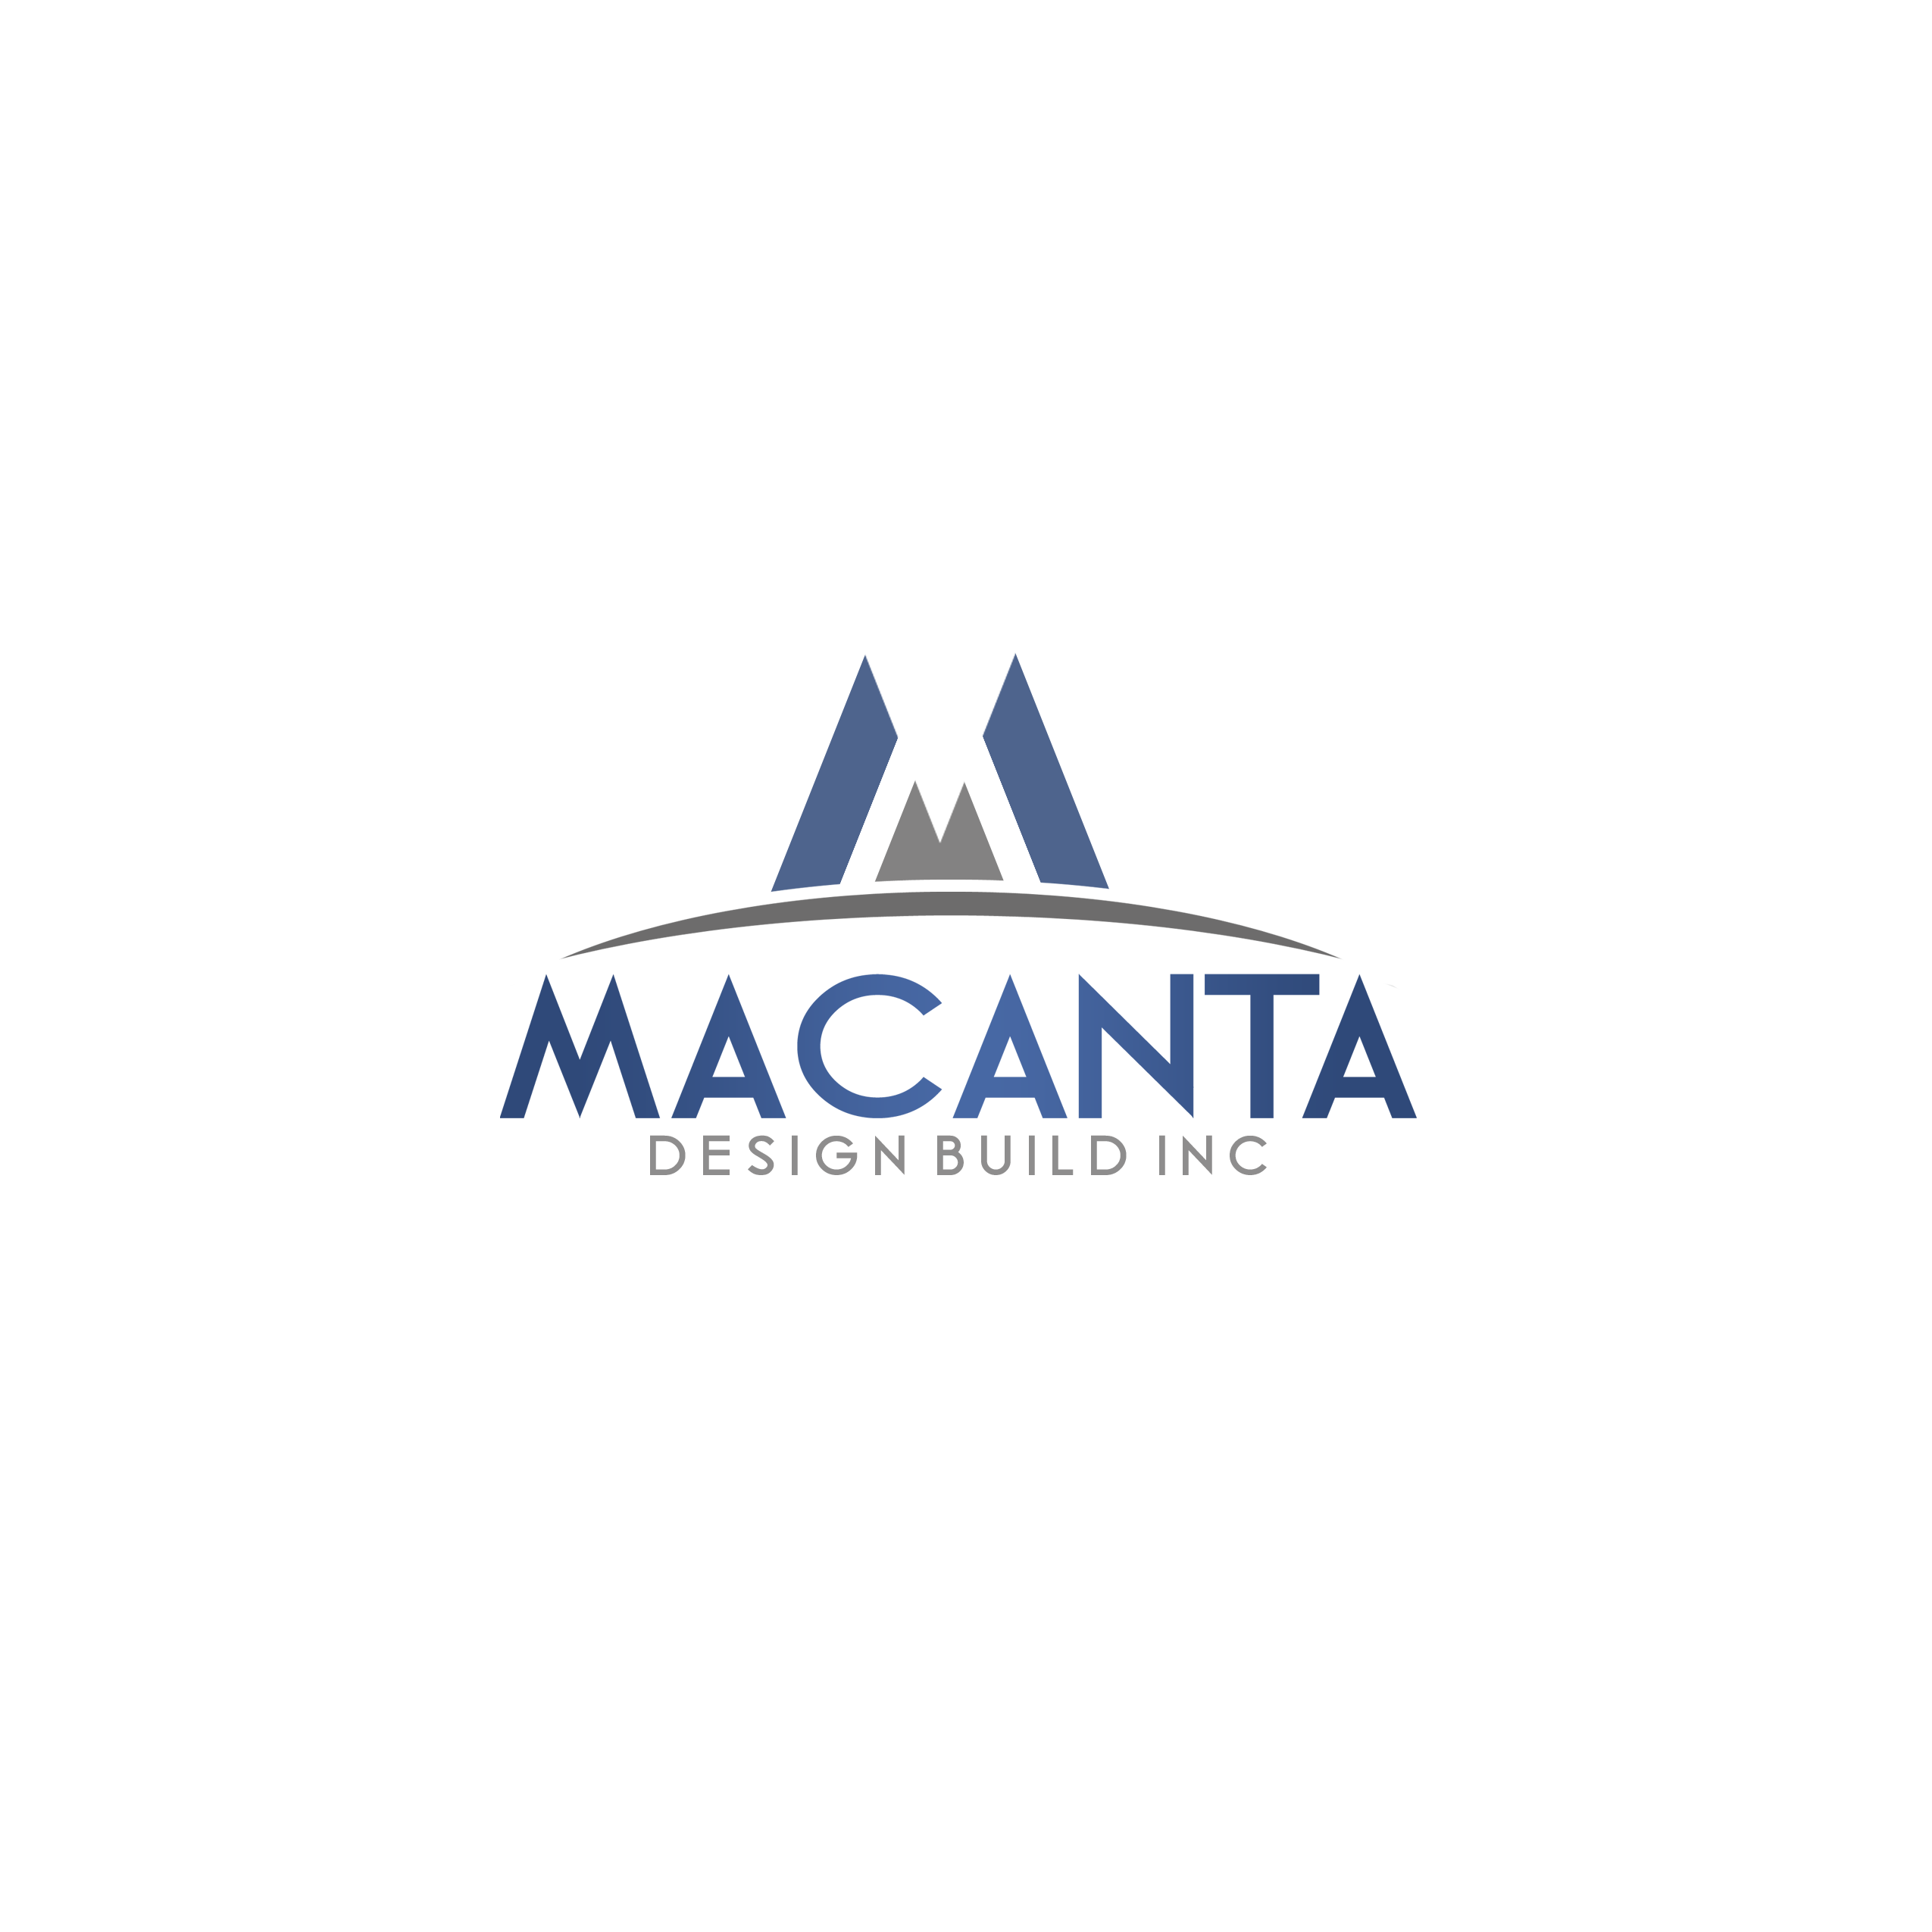 Logo Design by Allan Esclamado - Entry No. 74 in the Logo Design Contest Captivating Logo Design for Macanta Design Build Inc.